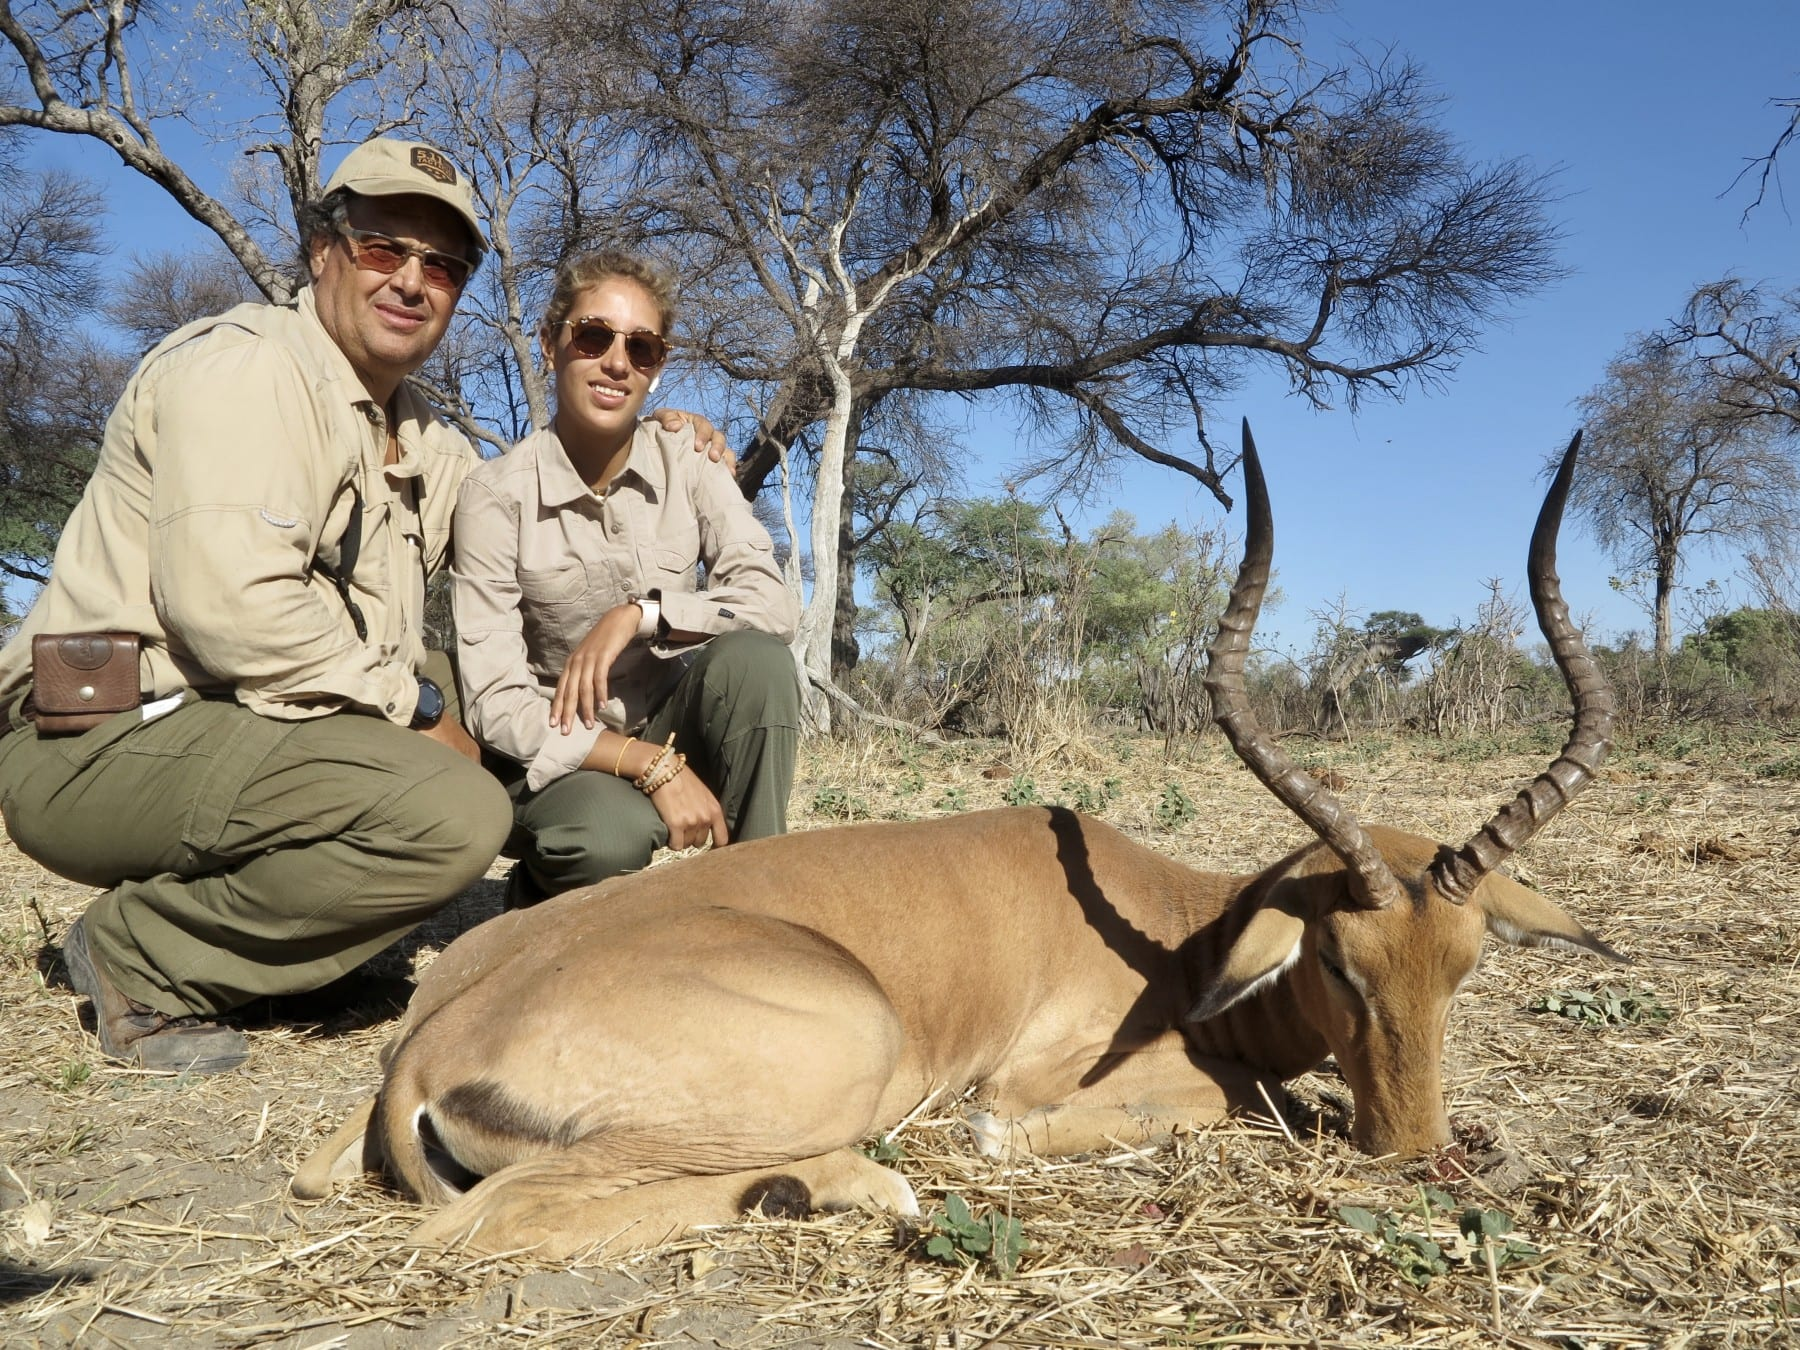 couples hunting safari africa